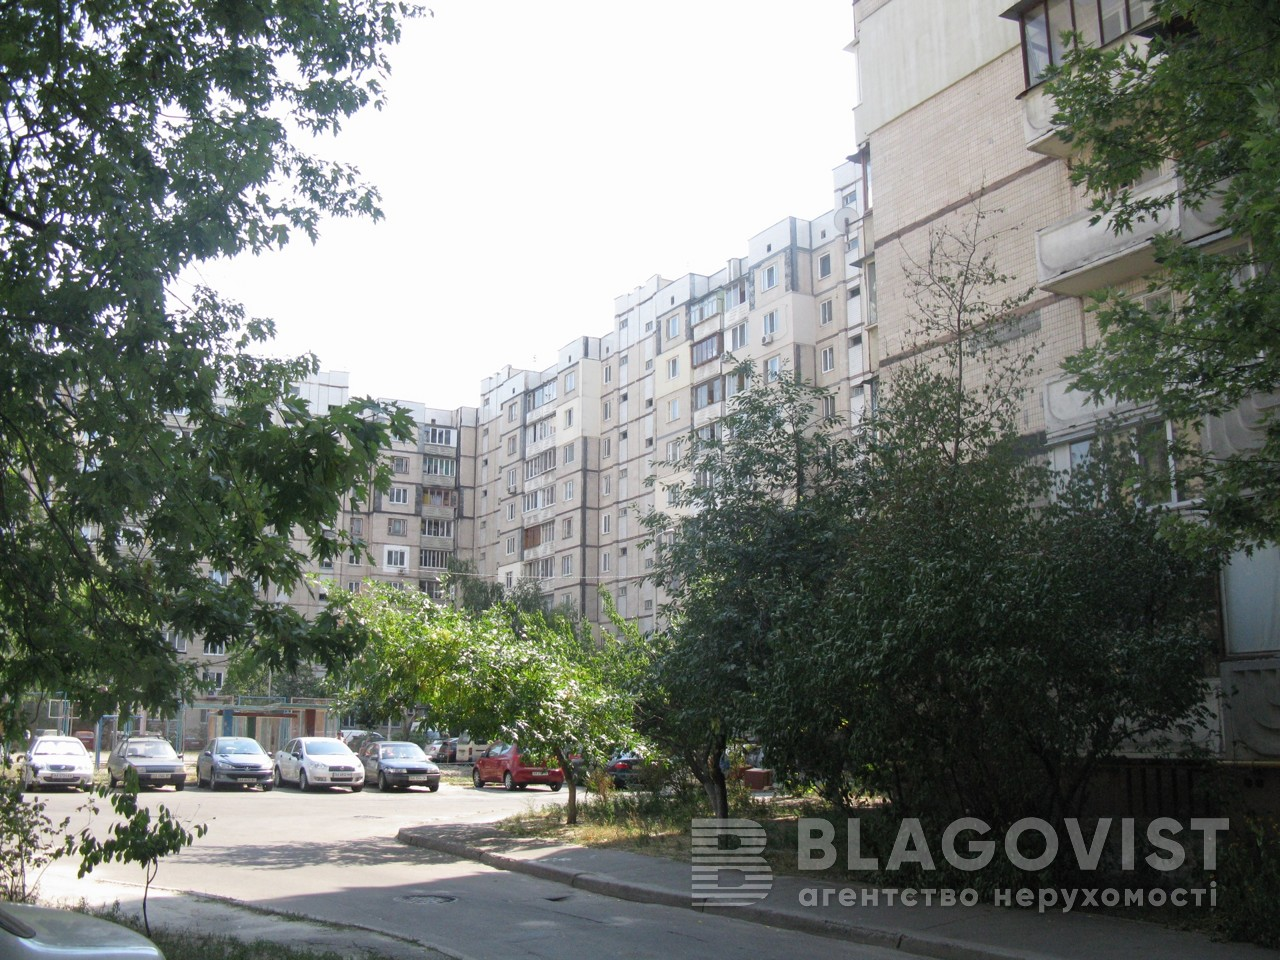 Квартира C-103521, Тростянецкая, 6, Киев - Фото 4